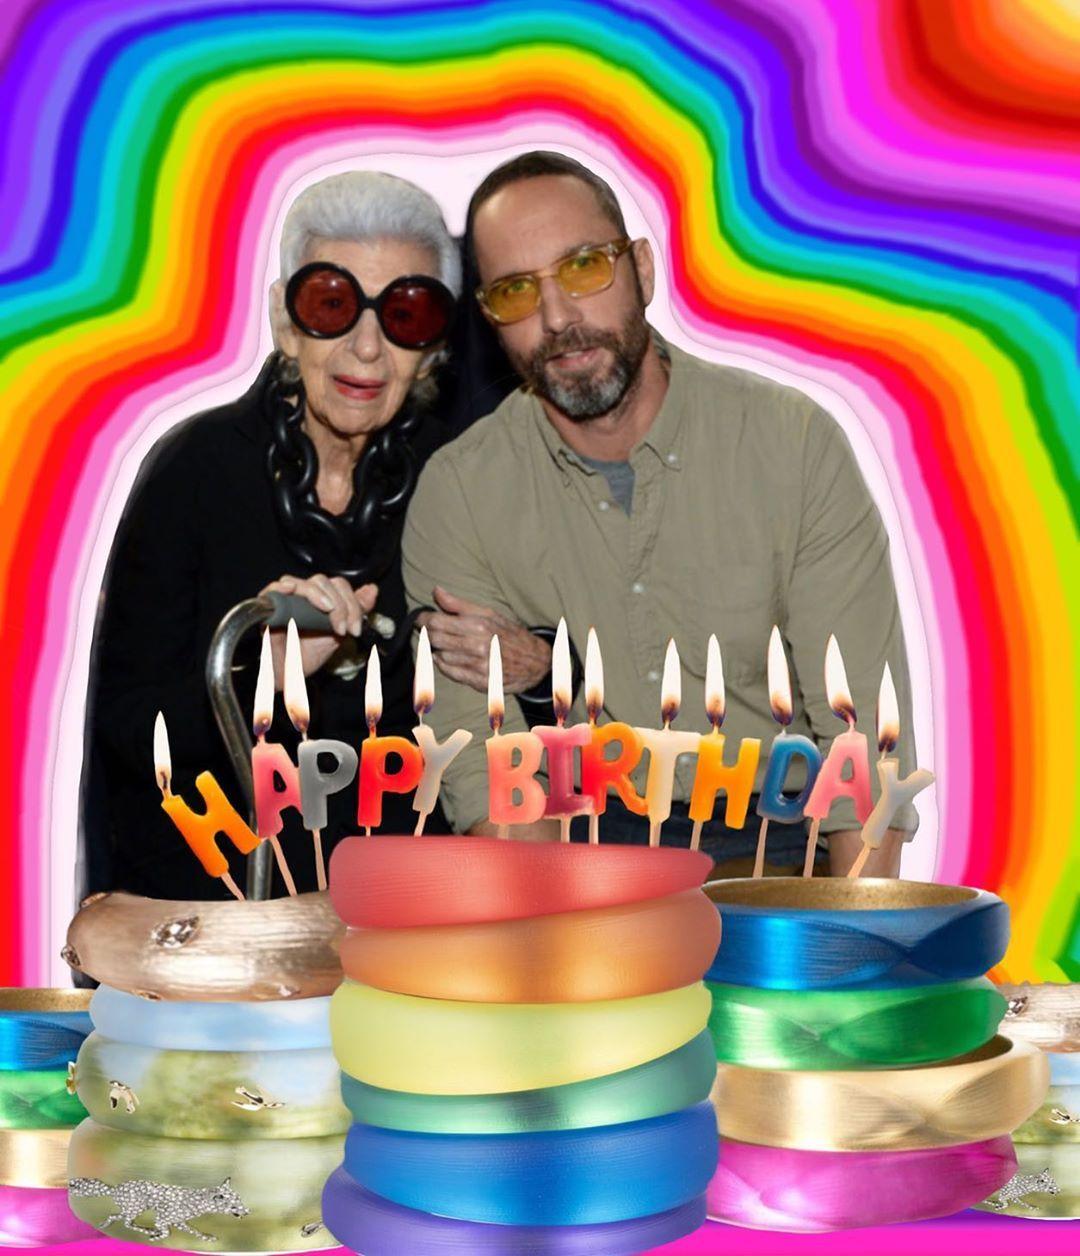 Iris The Coloring Book On Instagram Happy Birthday To Jewelry Designer Dear Friend Of Iris Apfel And Ut In Nyc Coloring Books Happy Birthday Dear Friend